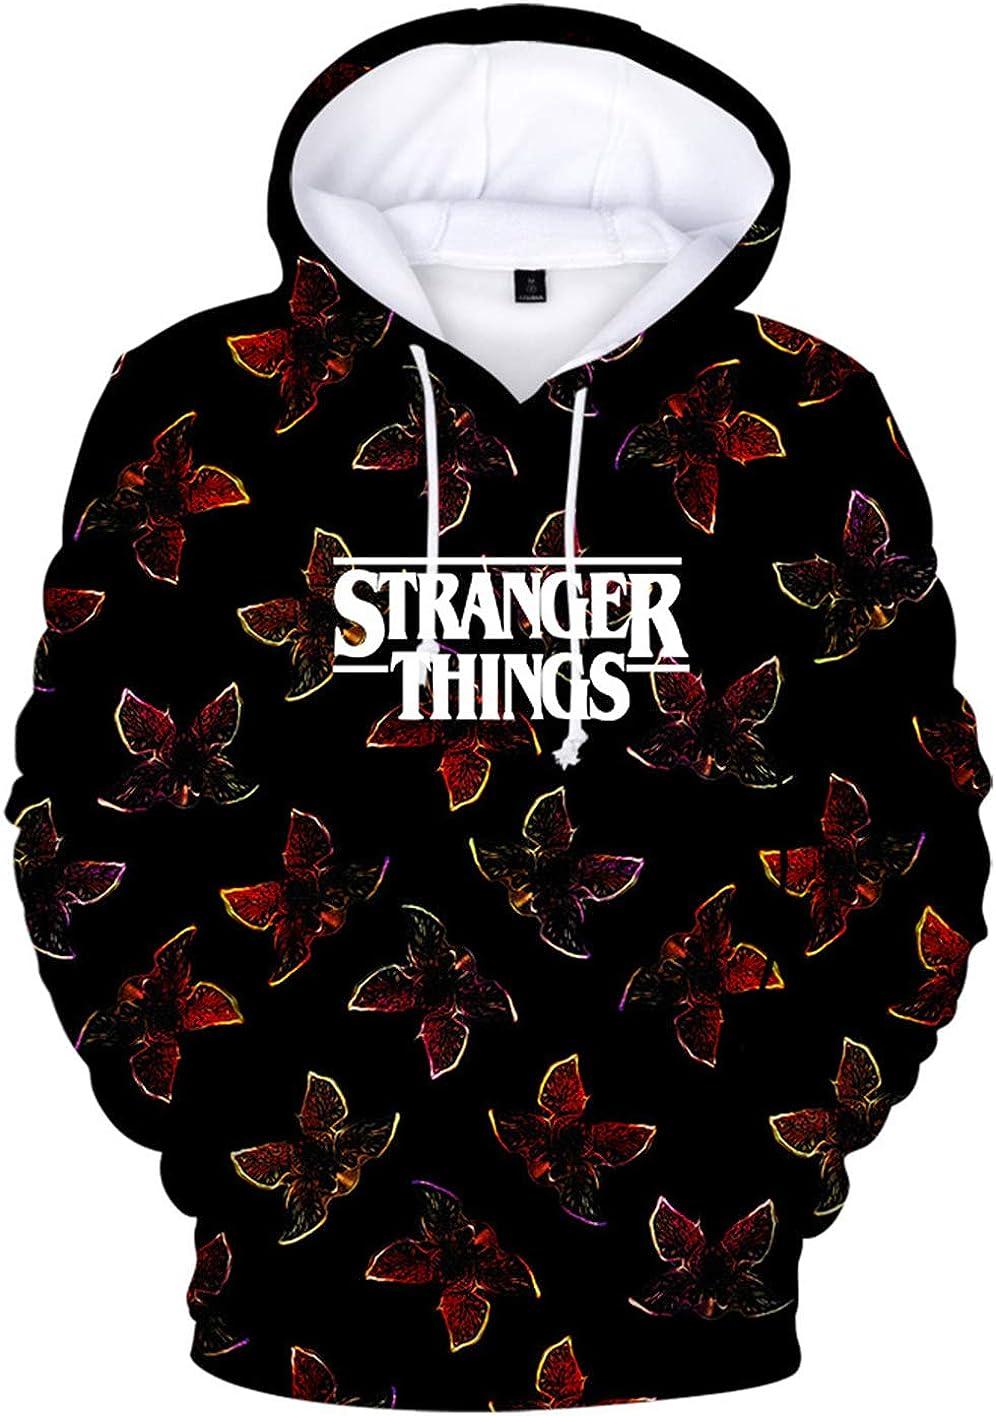 KamiraCoco Unisex Stranger Things Felpa con Cappuccio 3D Stranger Things Season 3 Stampato Felpa per Ragazzi e Ragazze